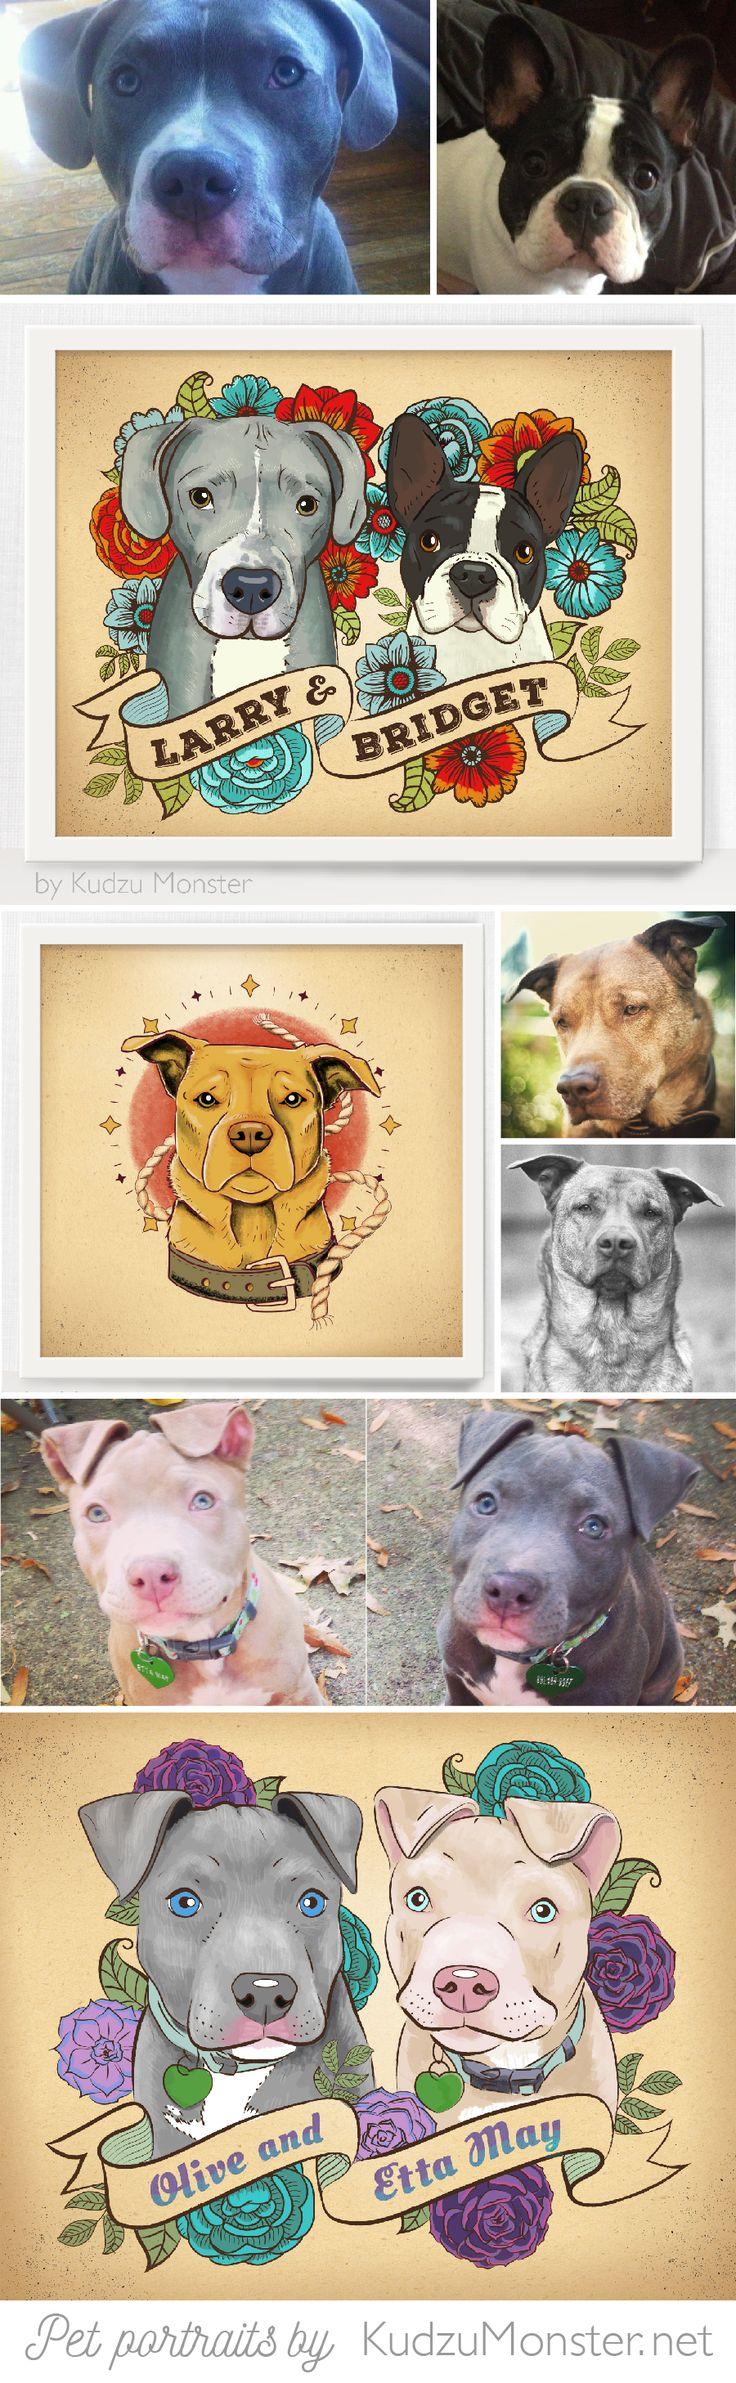 Custom pitbull portraits / pitbull tattoo design by KudzuMonster.net